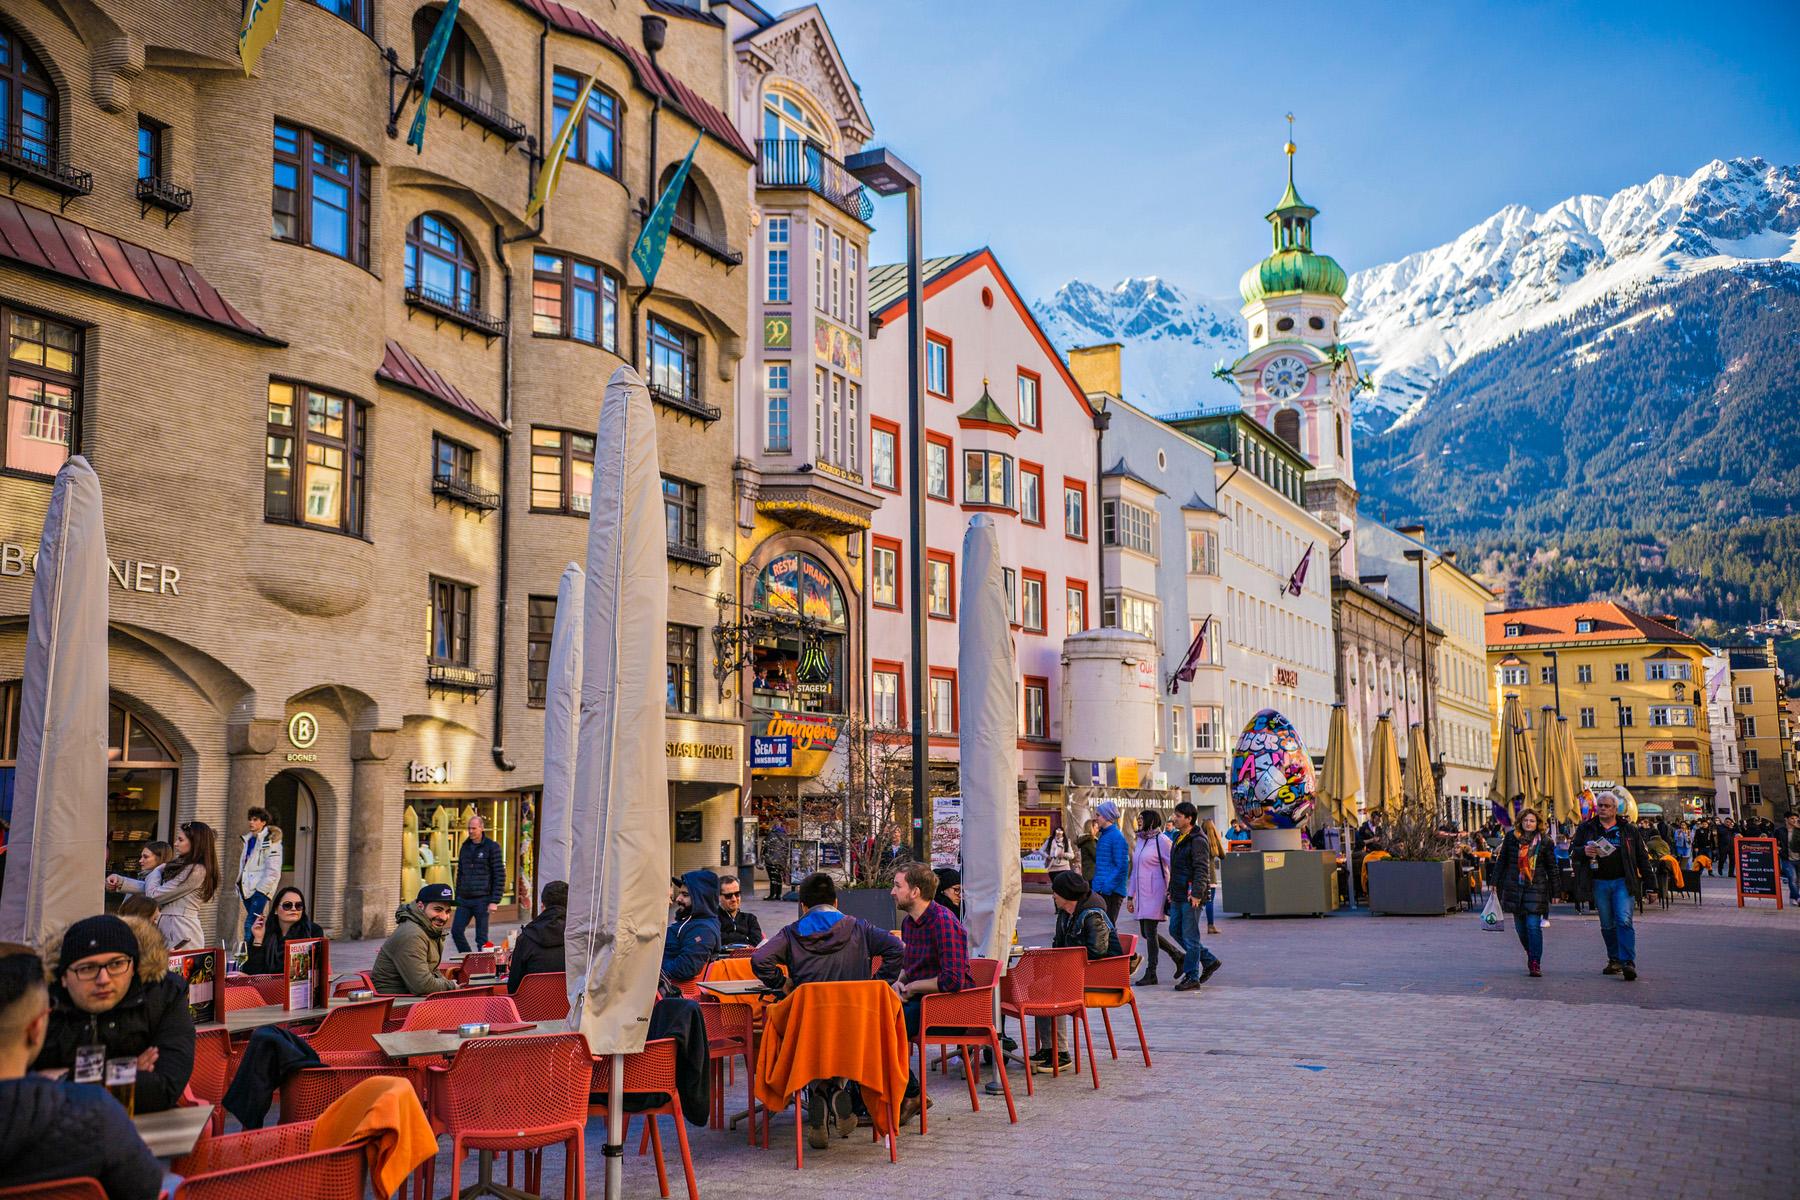 Innsbruck public square